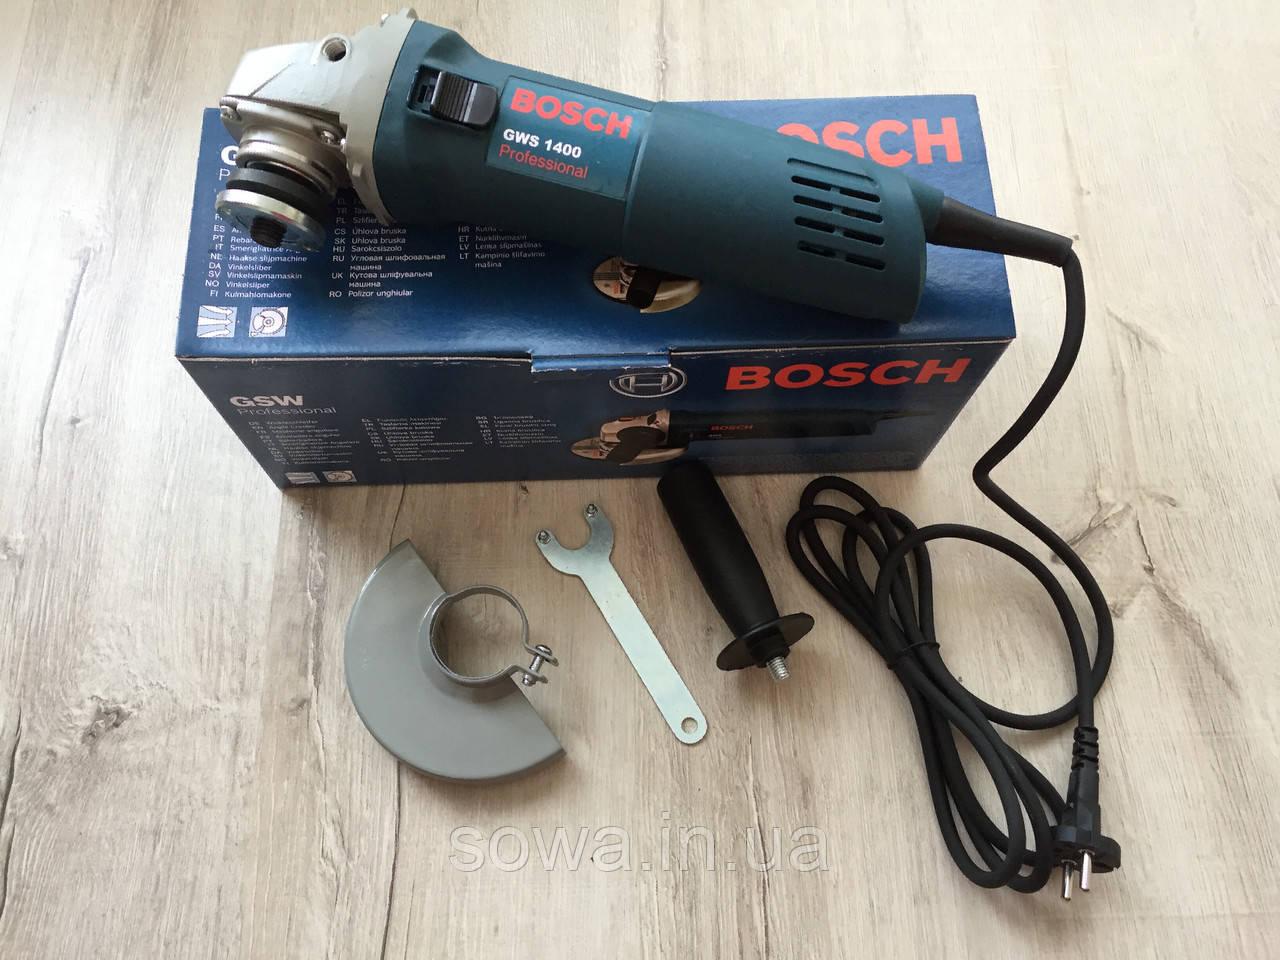 Болгарка BOSCH_ БОШ GWS1400 ( 1400 Вт, 125 мм ) + ПОДАРОК - фото 9